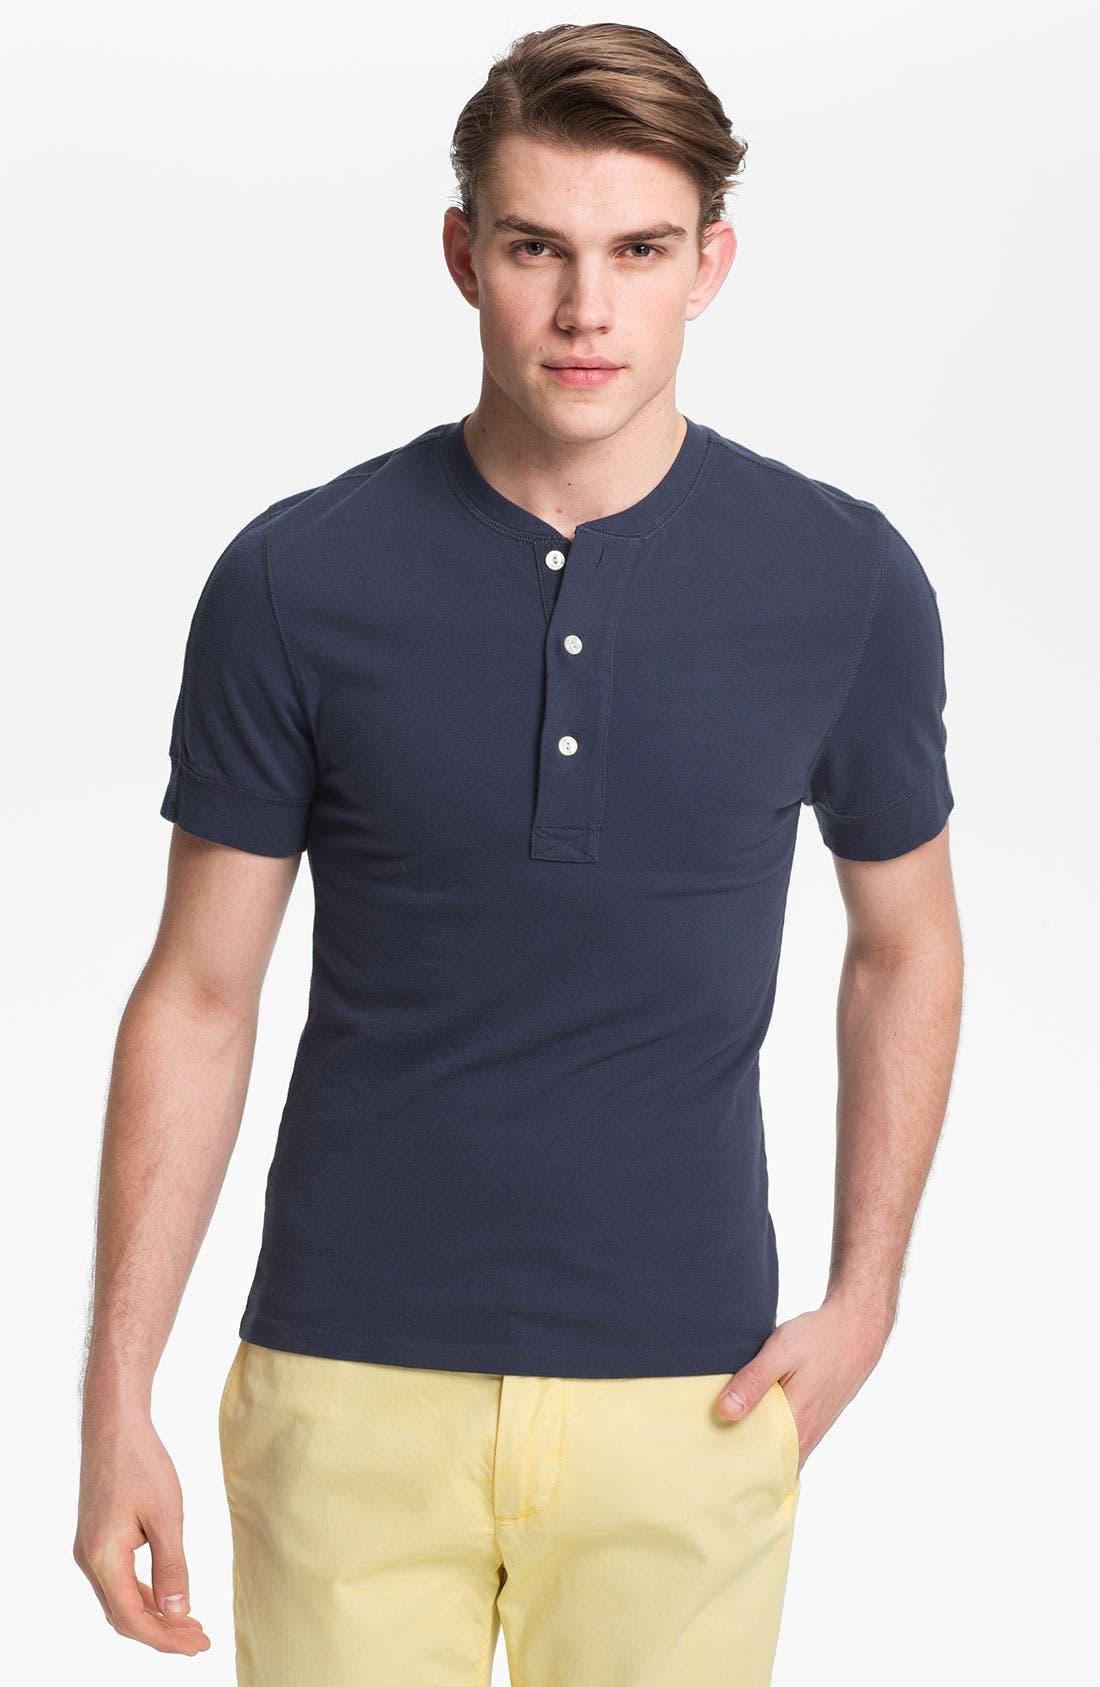 Alternate Image 1 Selected - Jack Spade 'Nolan' Henley T-Shirt